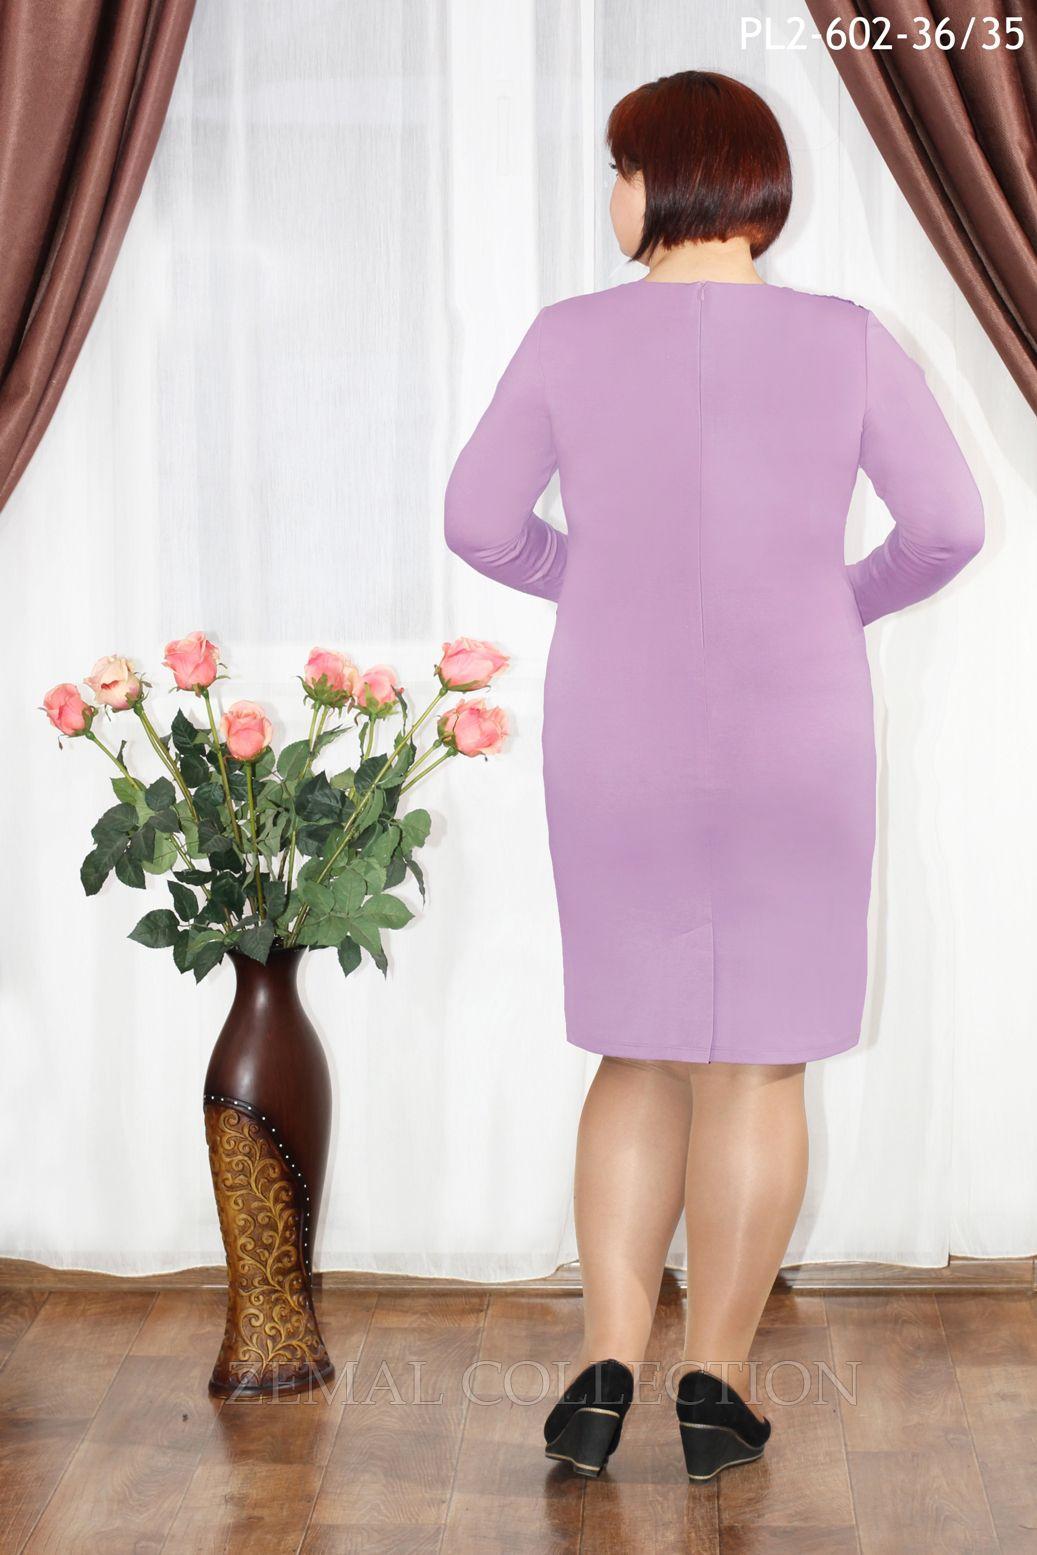 Сукня pl2-602 купить на сайте производителя